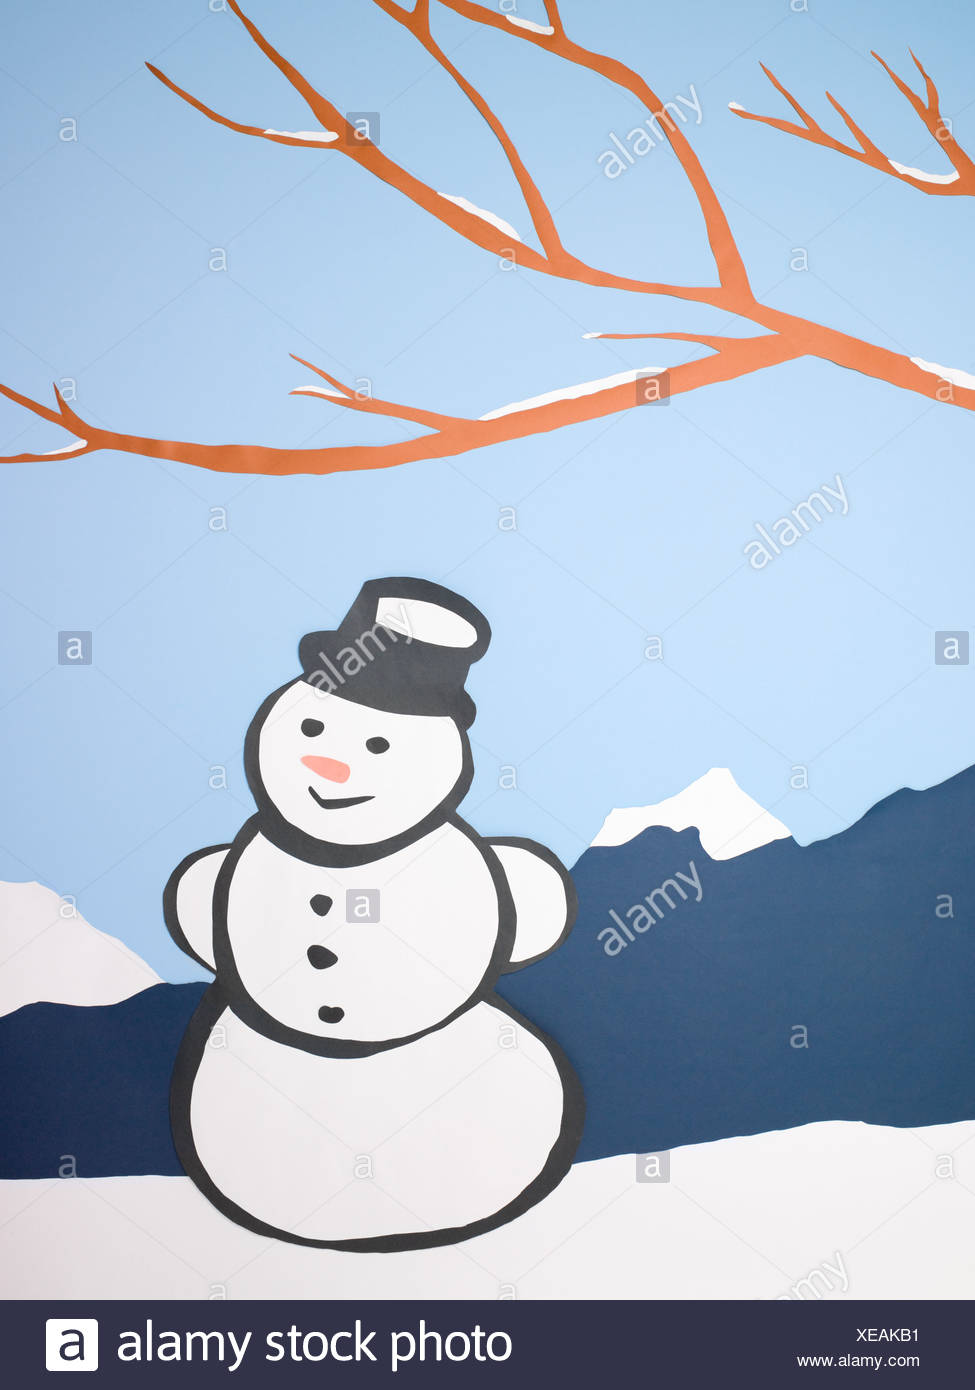 Snowman in winter scene - Stock Image